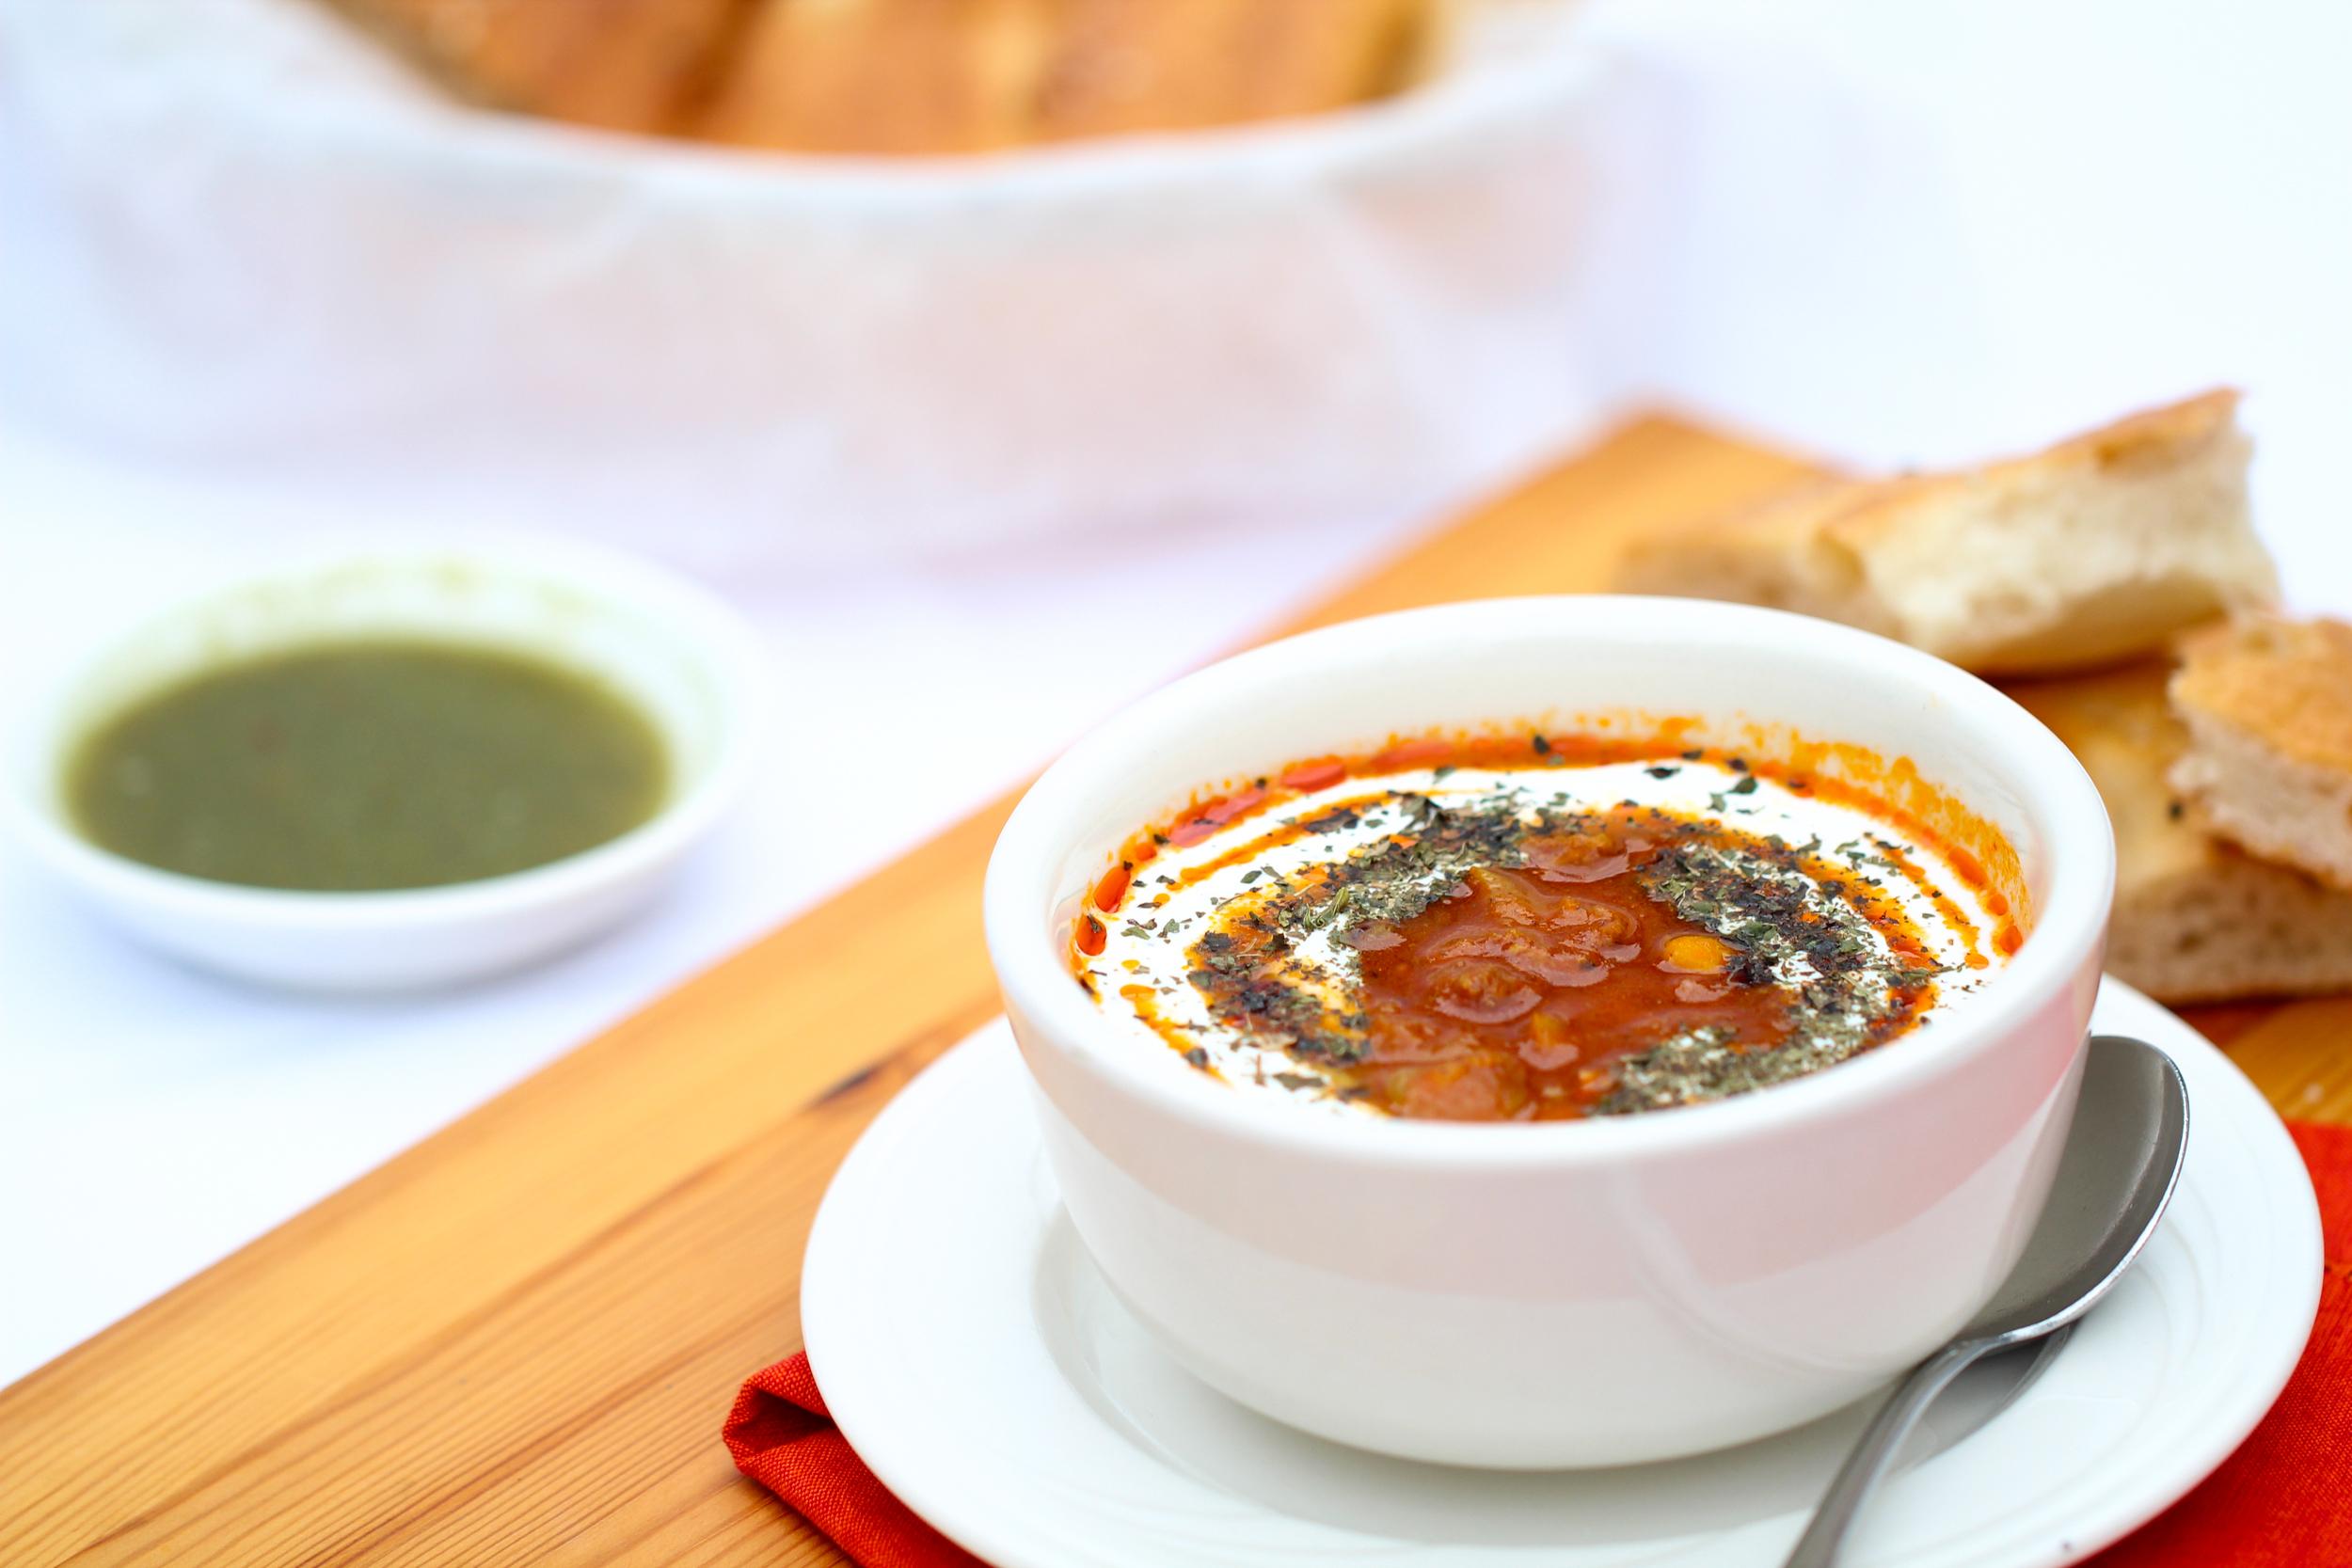 Panjshir Cam 1-4-nabu-food-photography.jpg